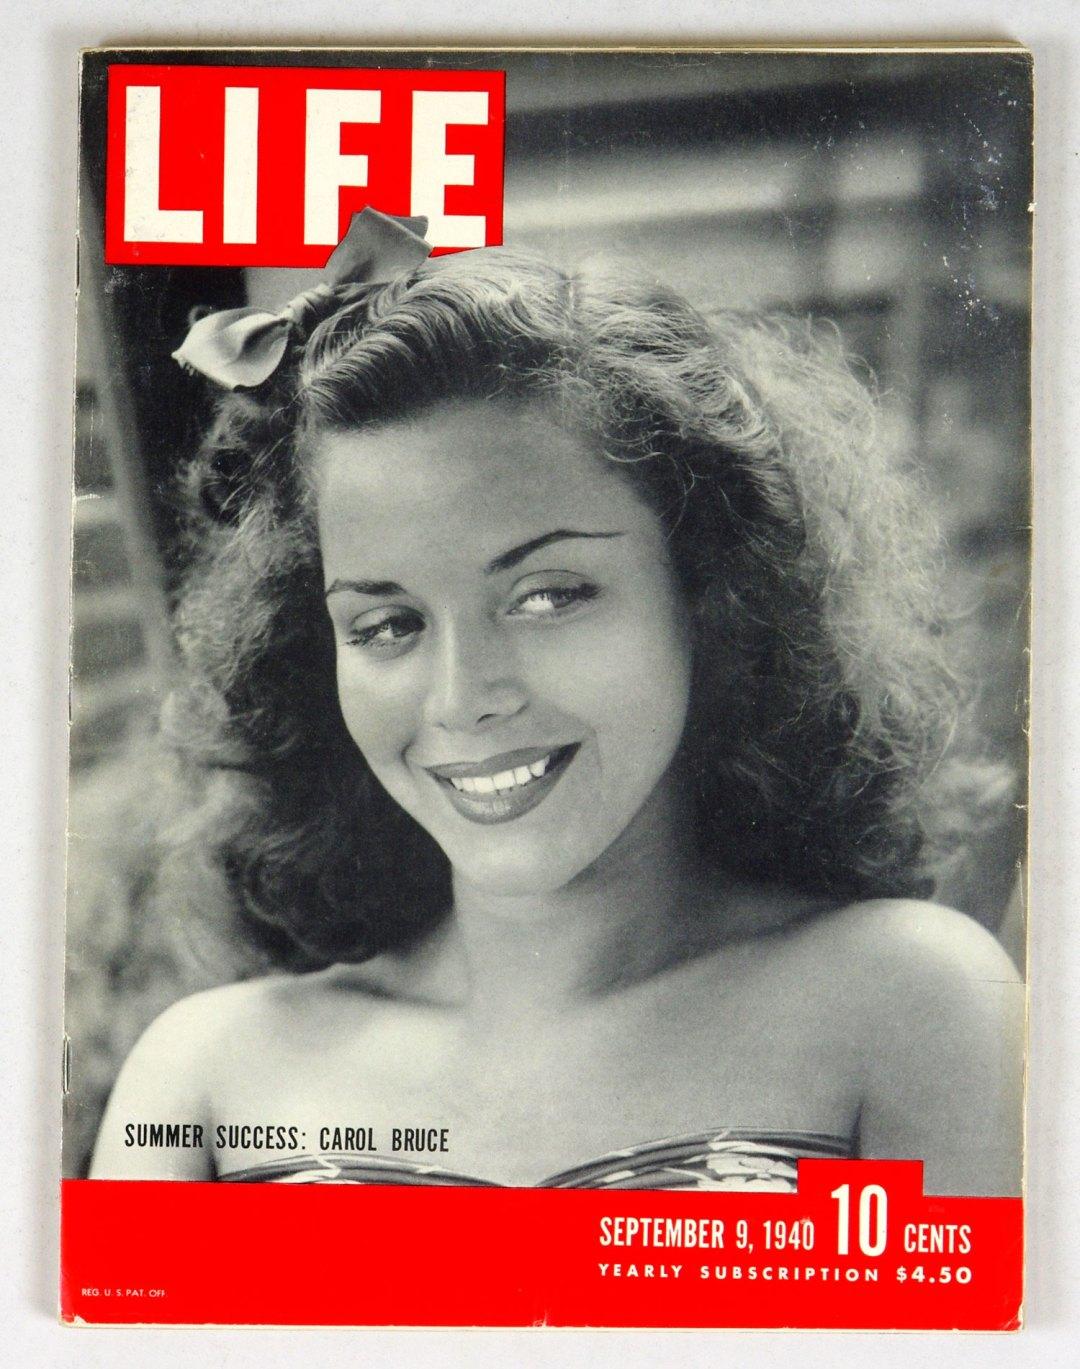 LIFE Magazine 1940 September 9 Summer Success Carol Bruce